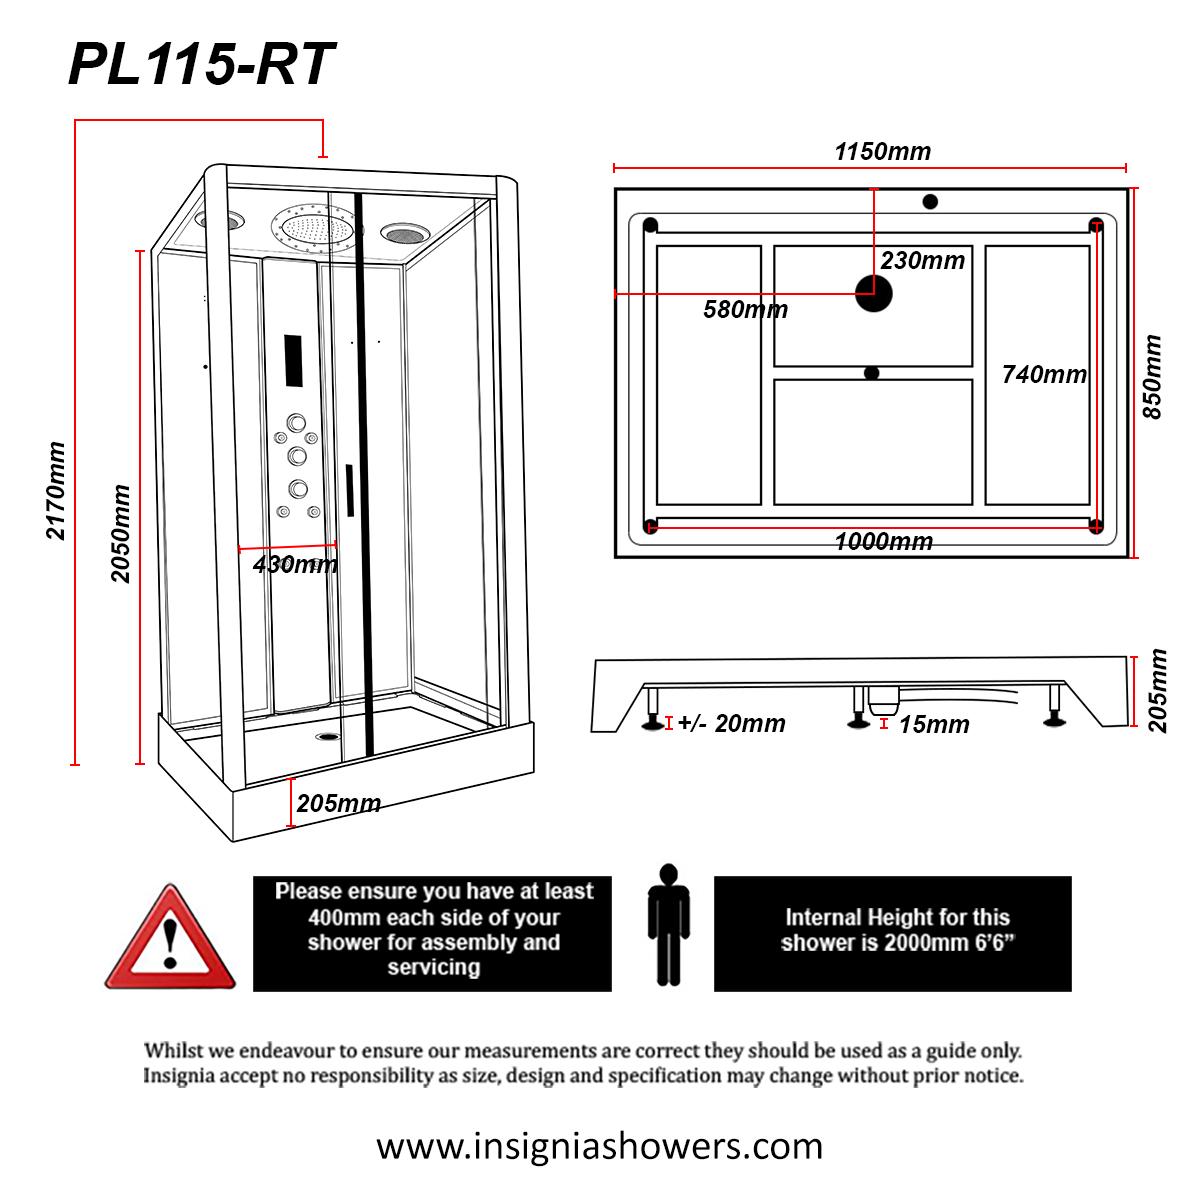 PL115-RT